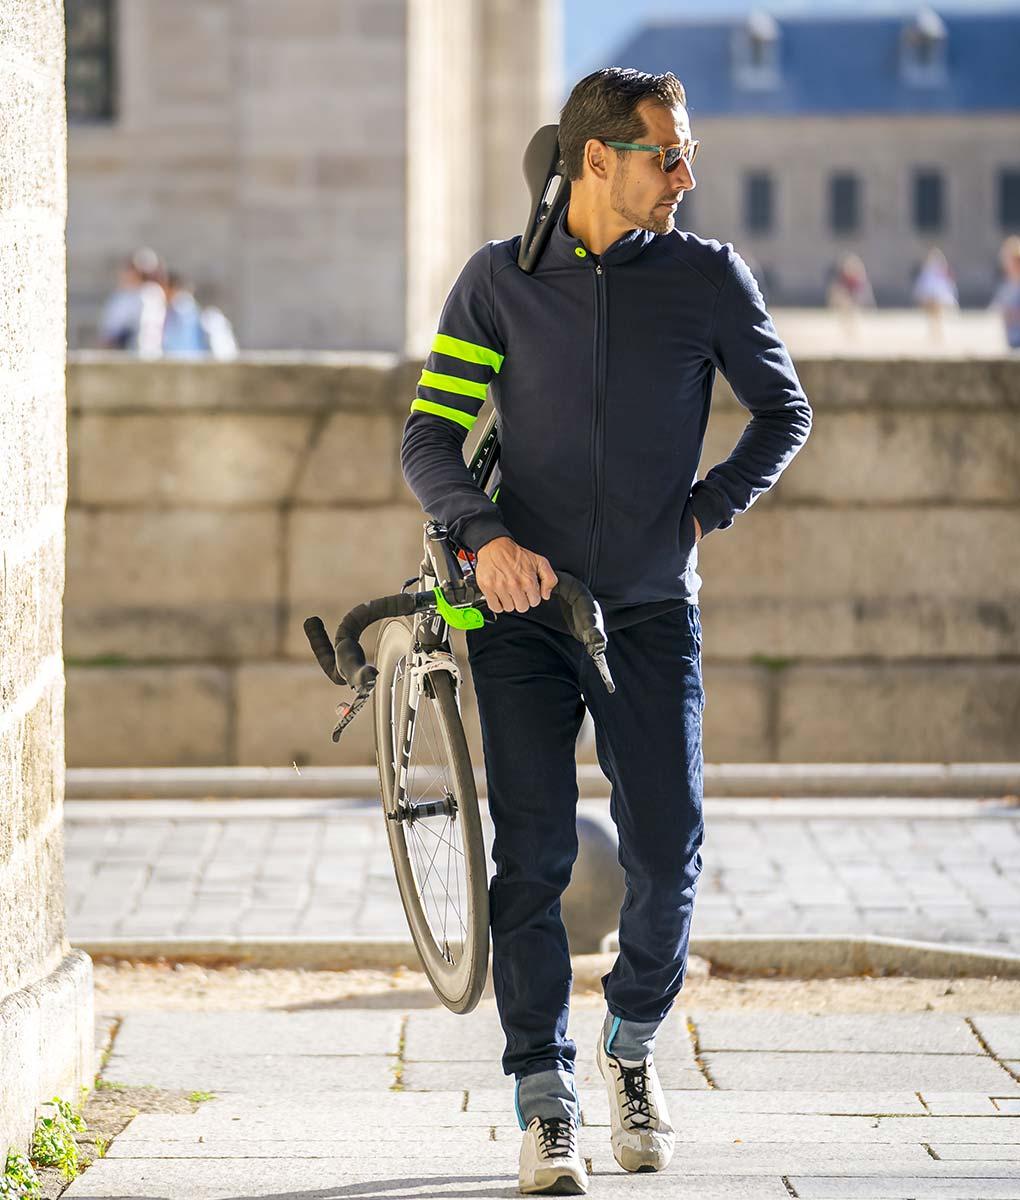 casual-cycling-jacket-fluor-dark-blue-front-bike